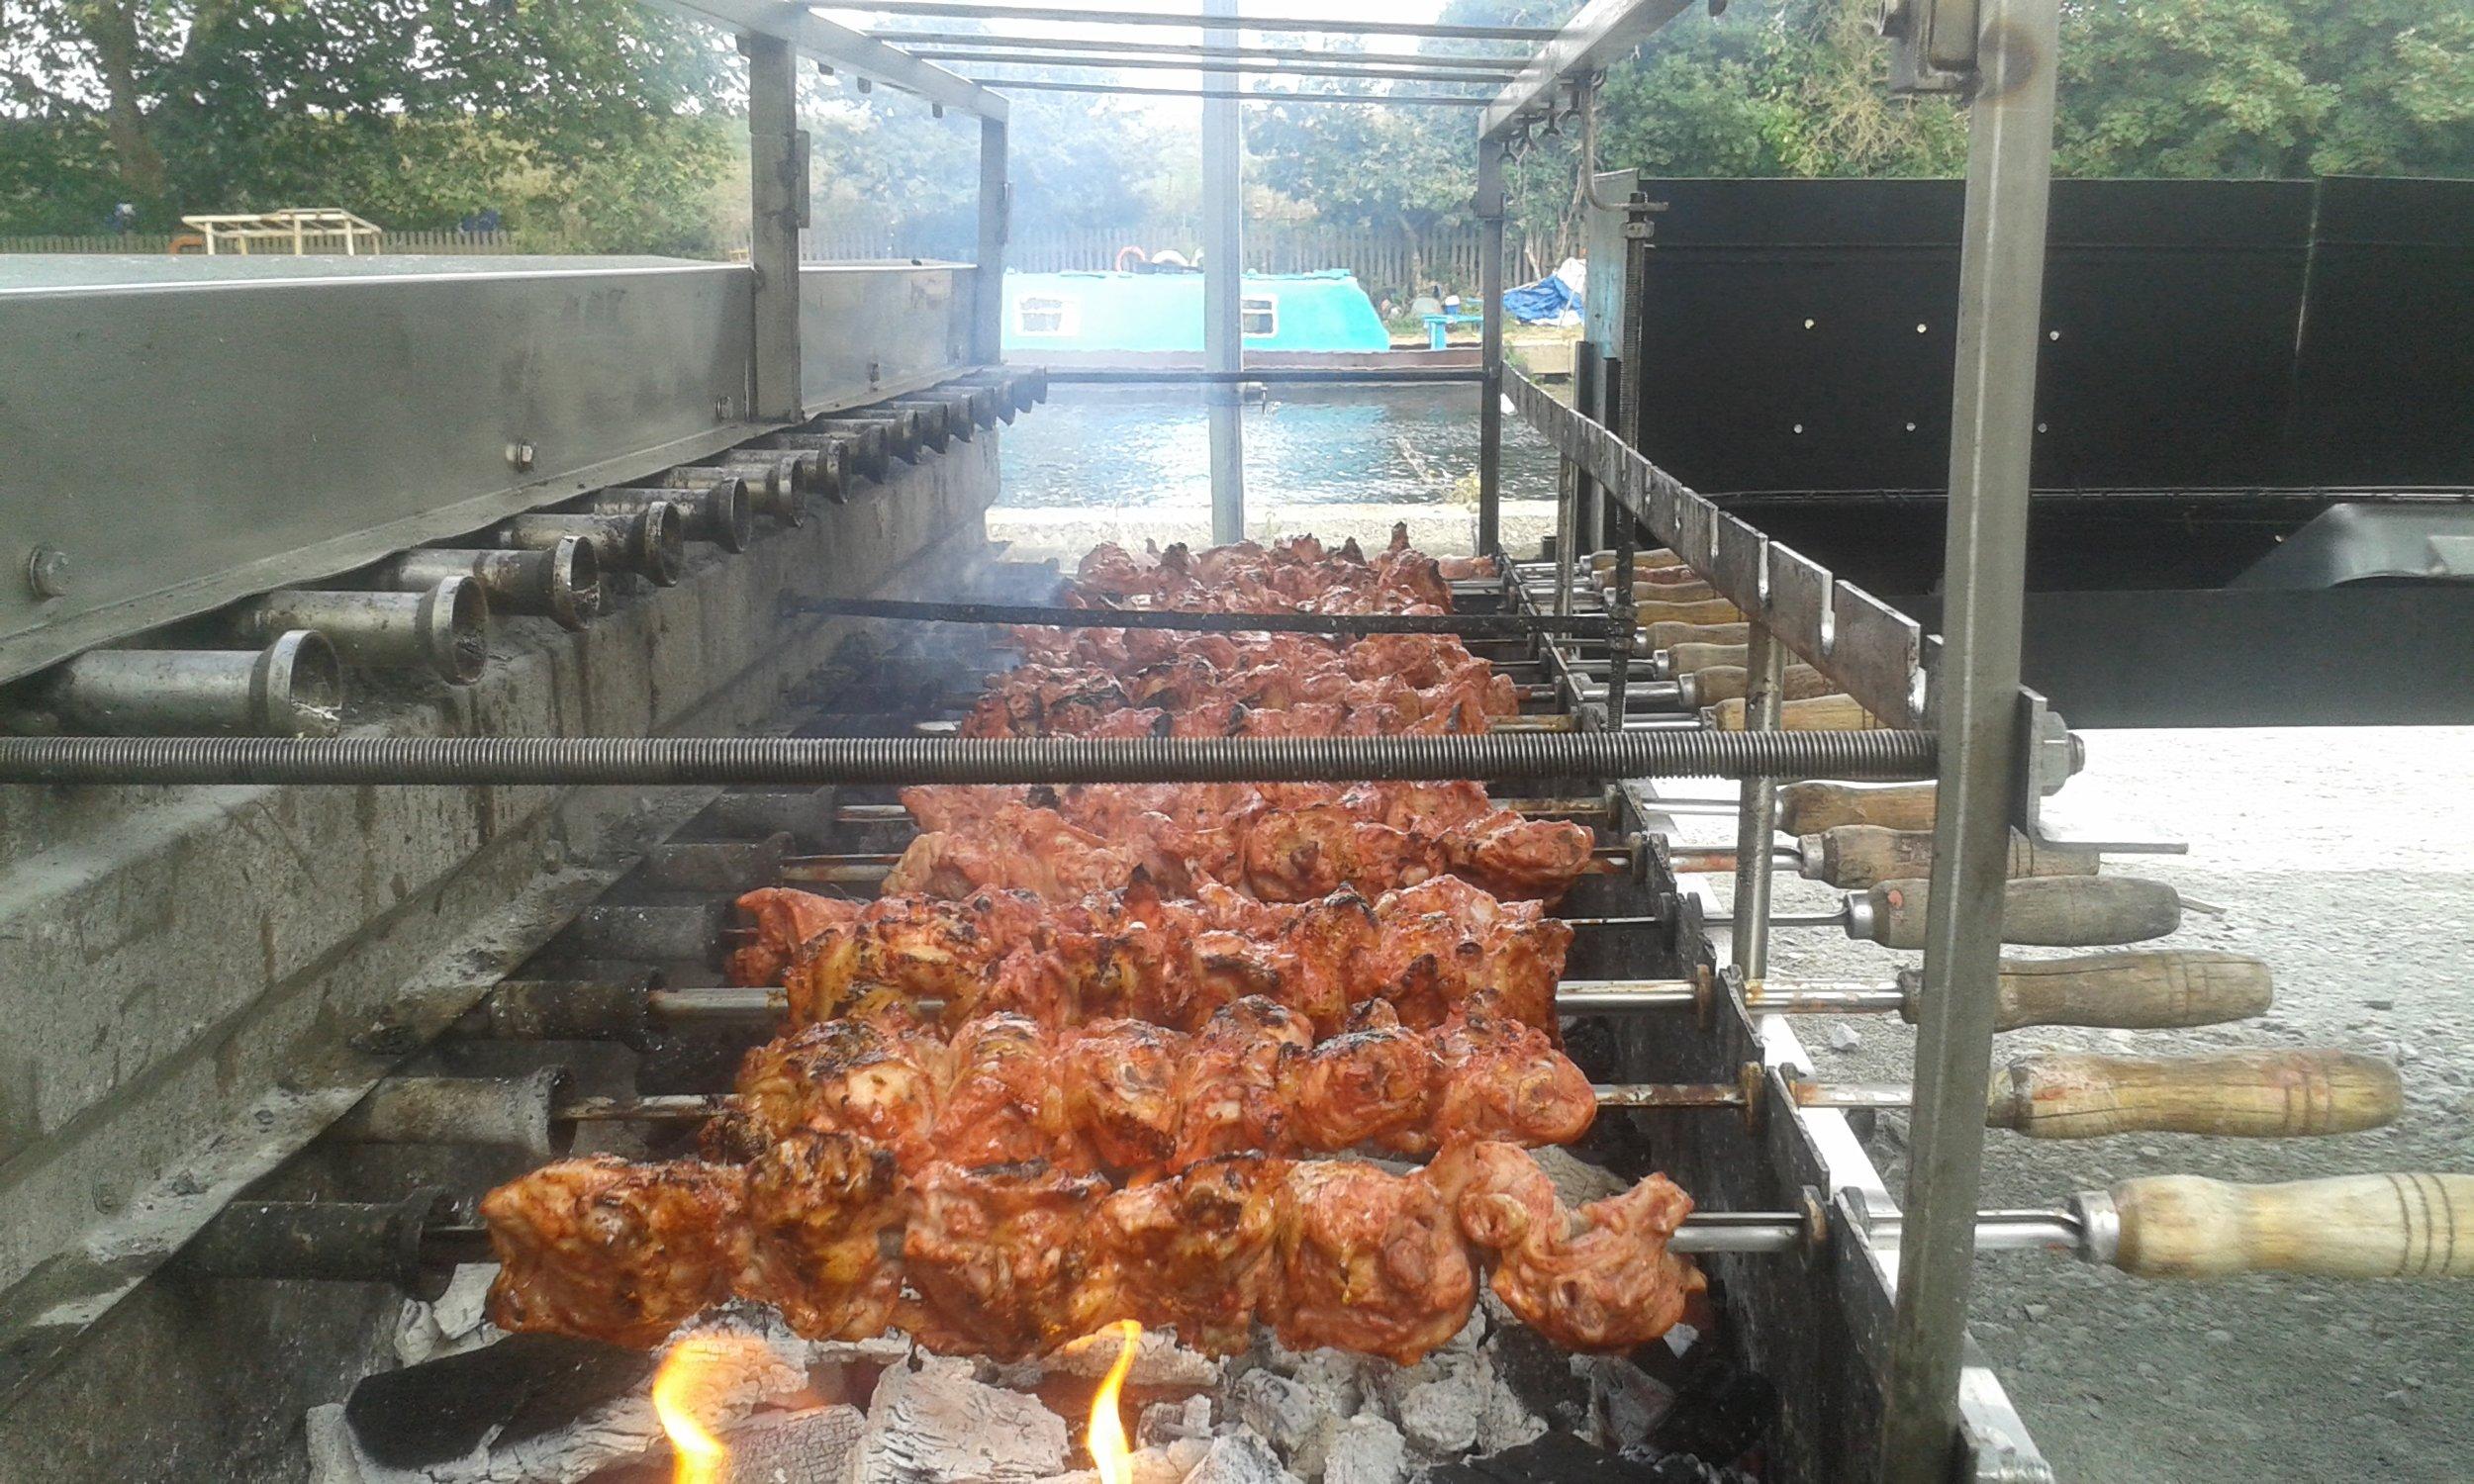 Rotisserie chicken by river.jpg